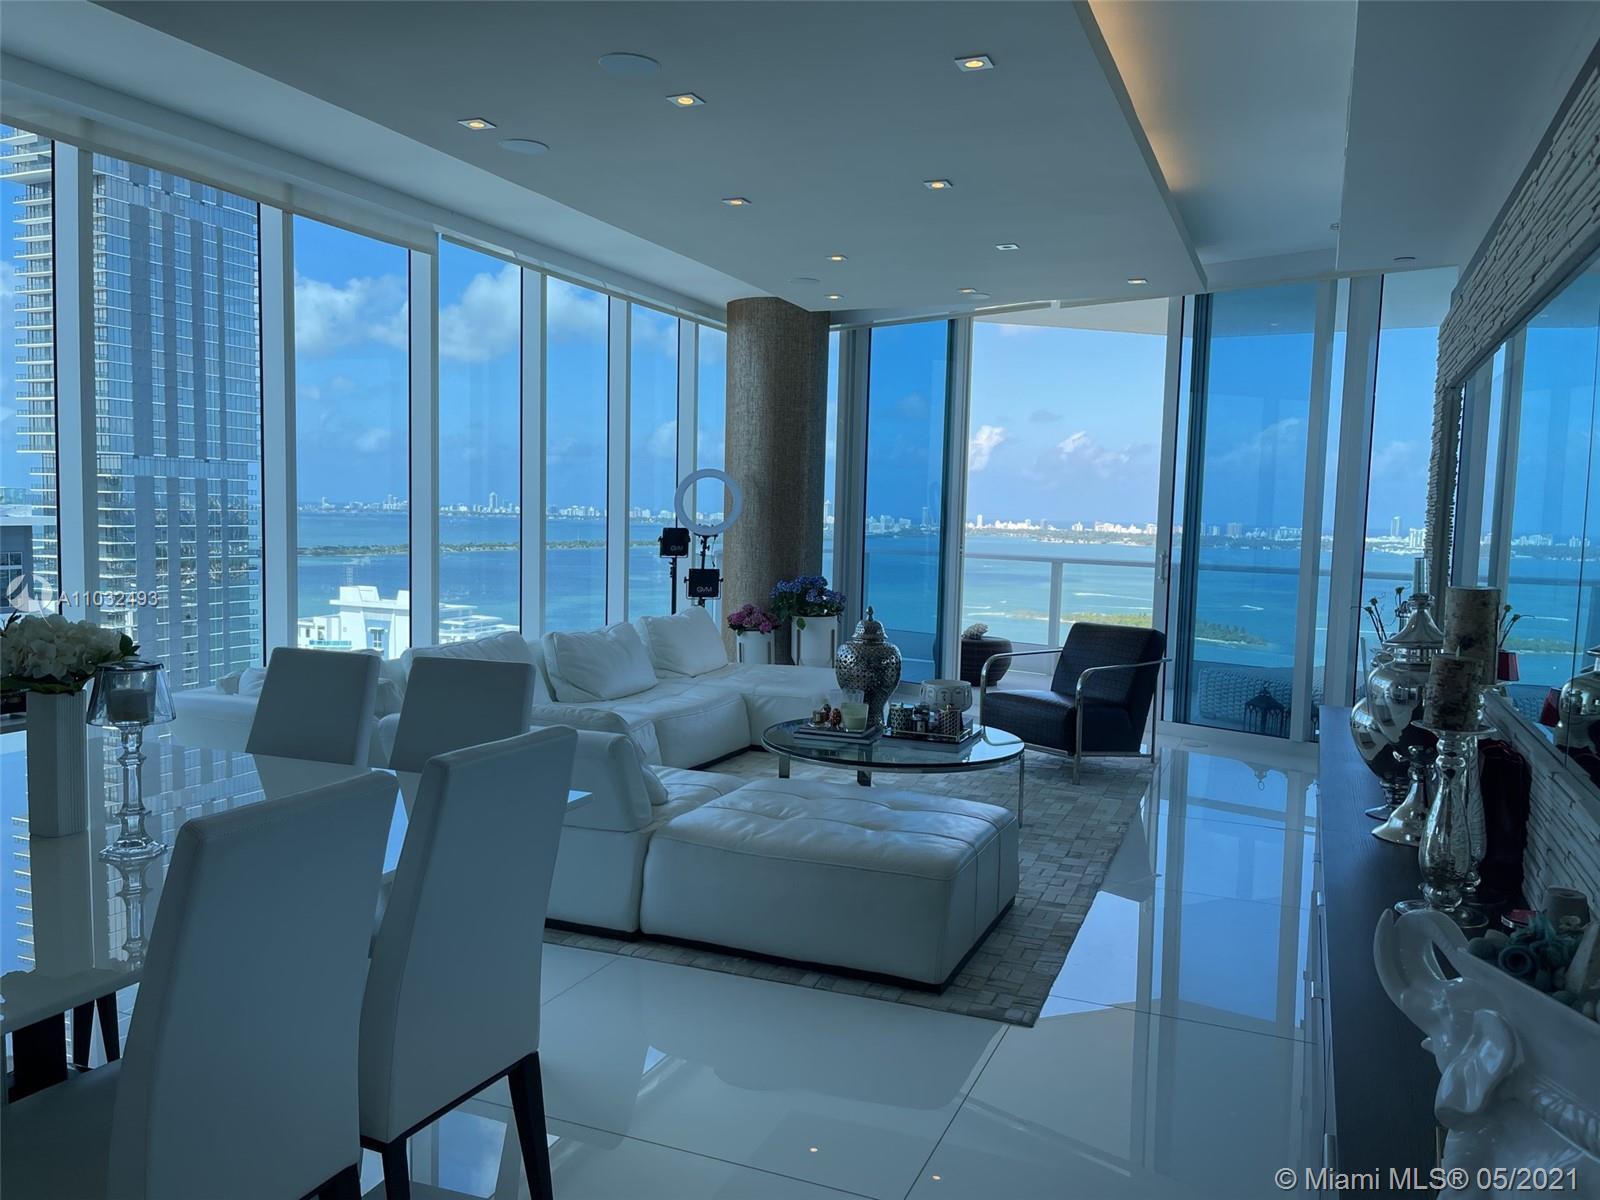 Paramount Bay #3001 - 2020 N BAYSHORE DR. #3001, Miami, FL 33137